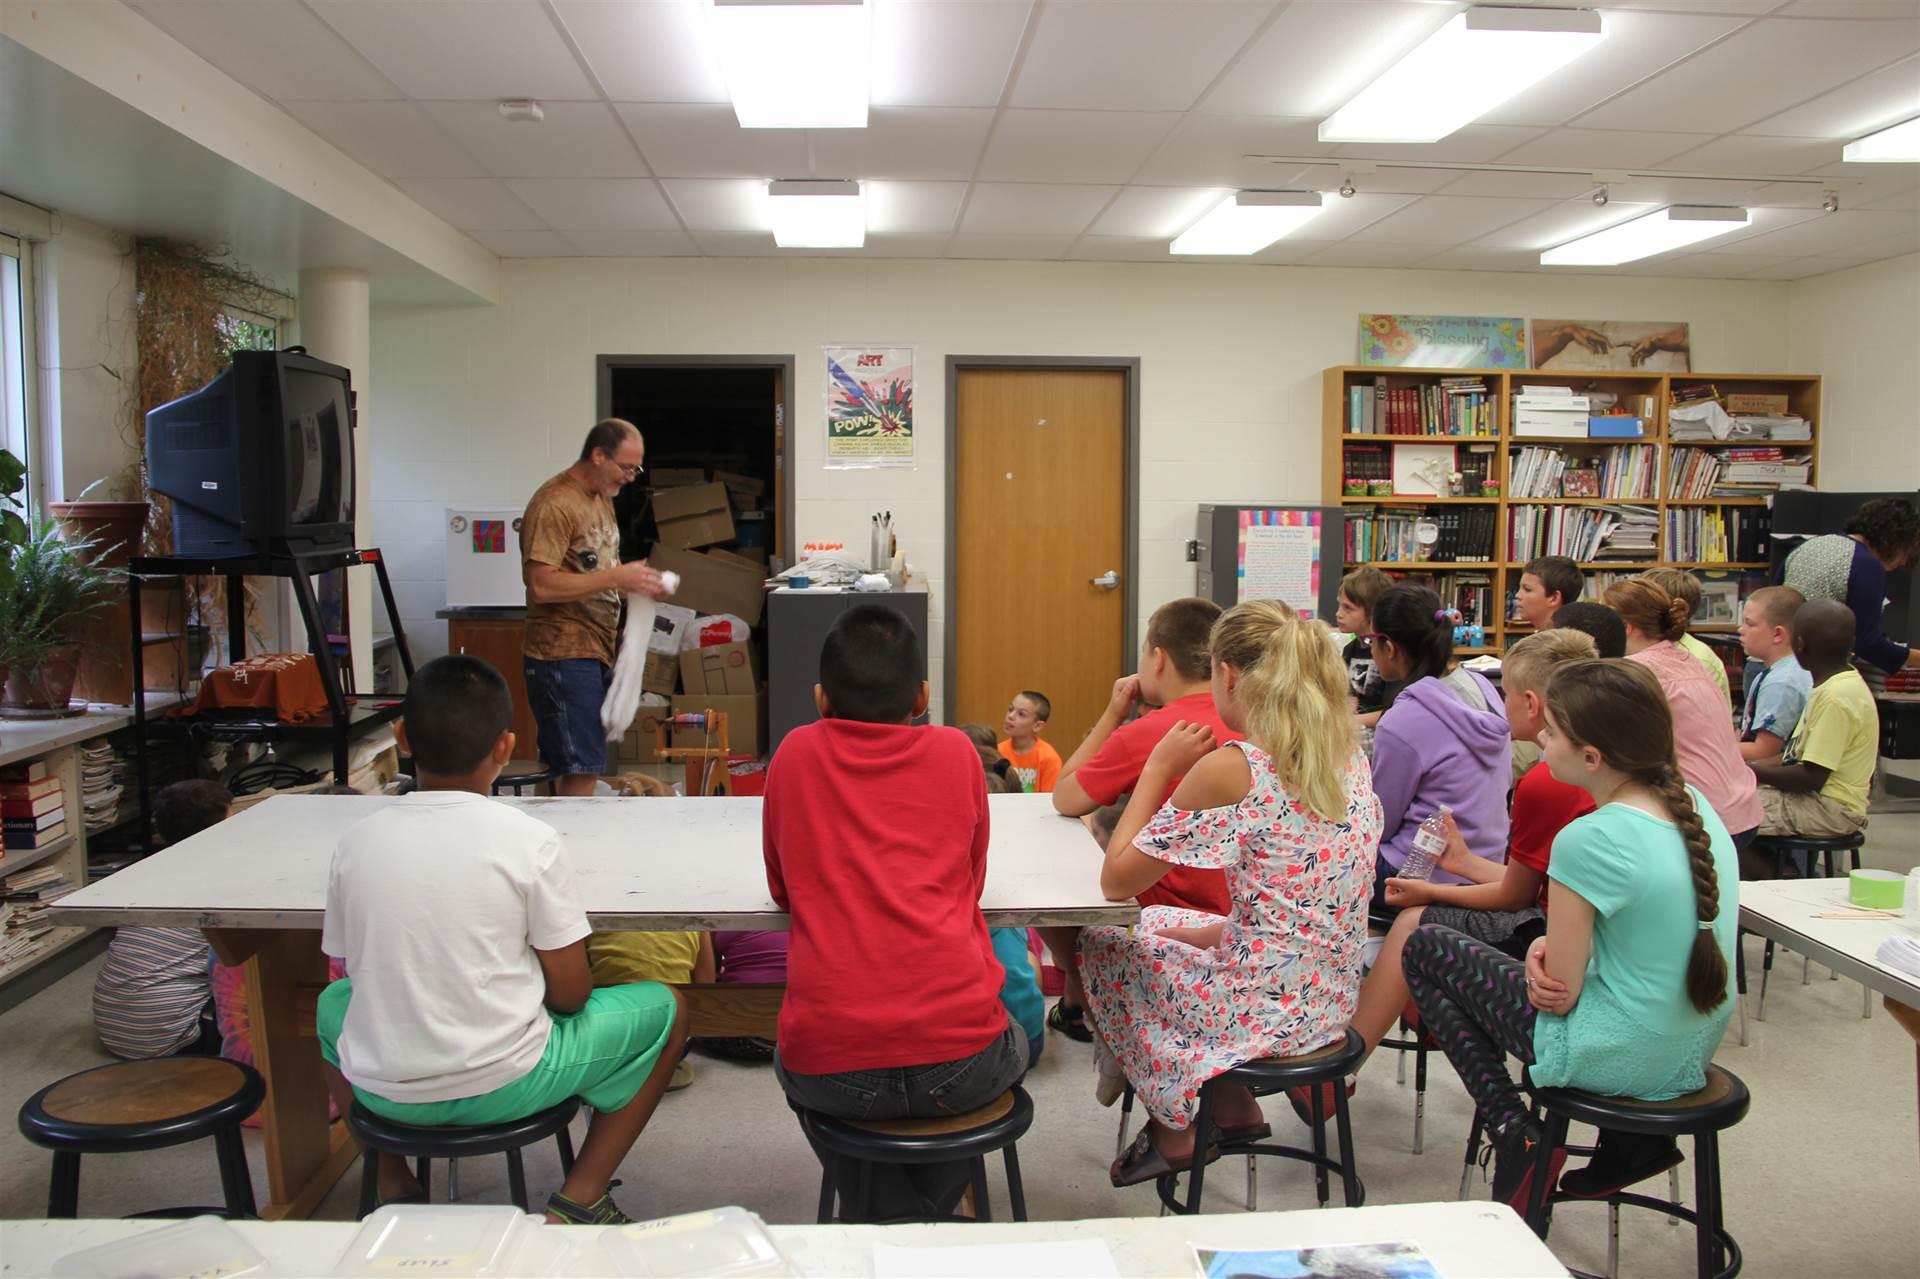 chris mckinney talks to students about alpaca wool